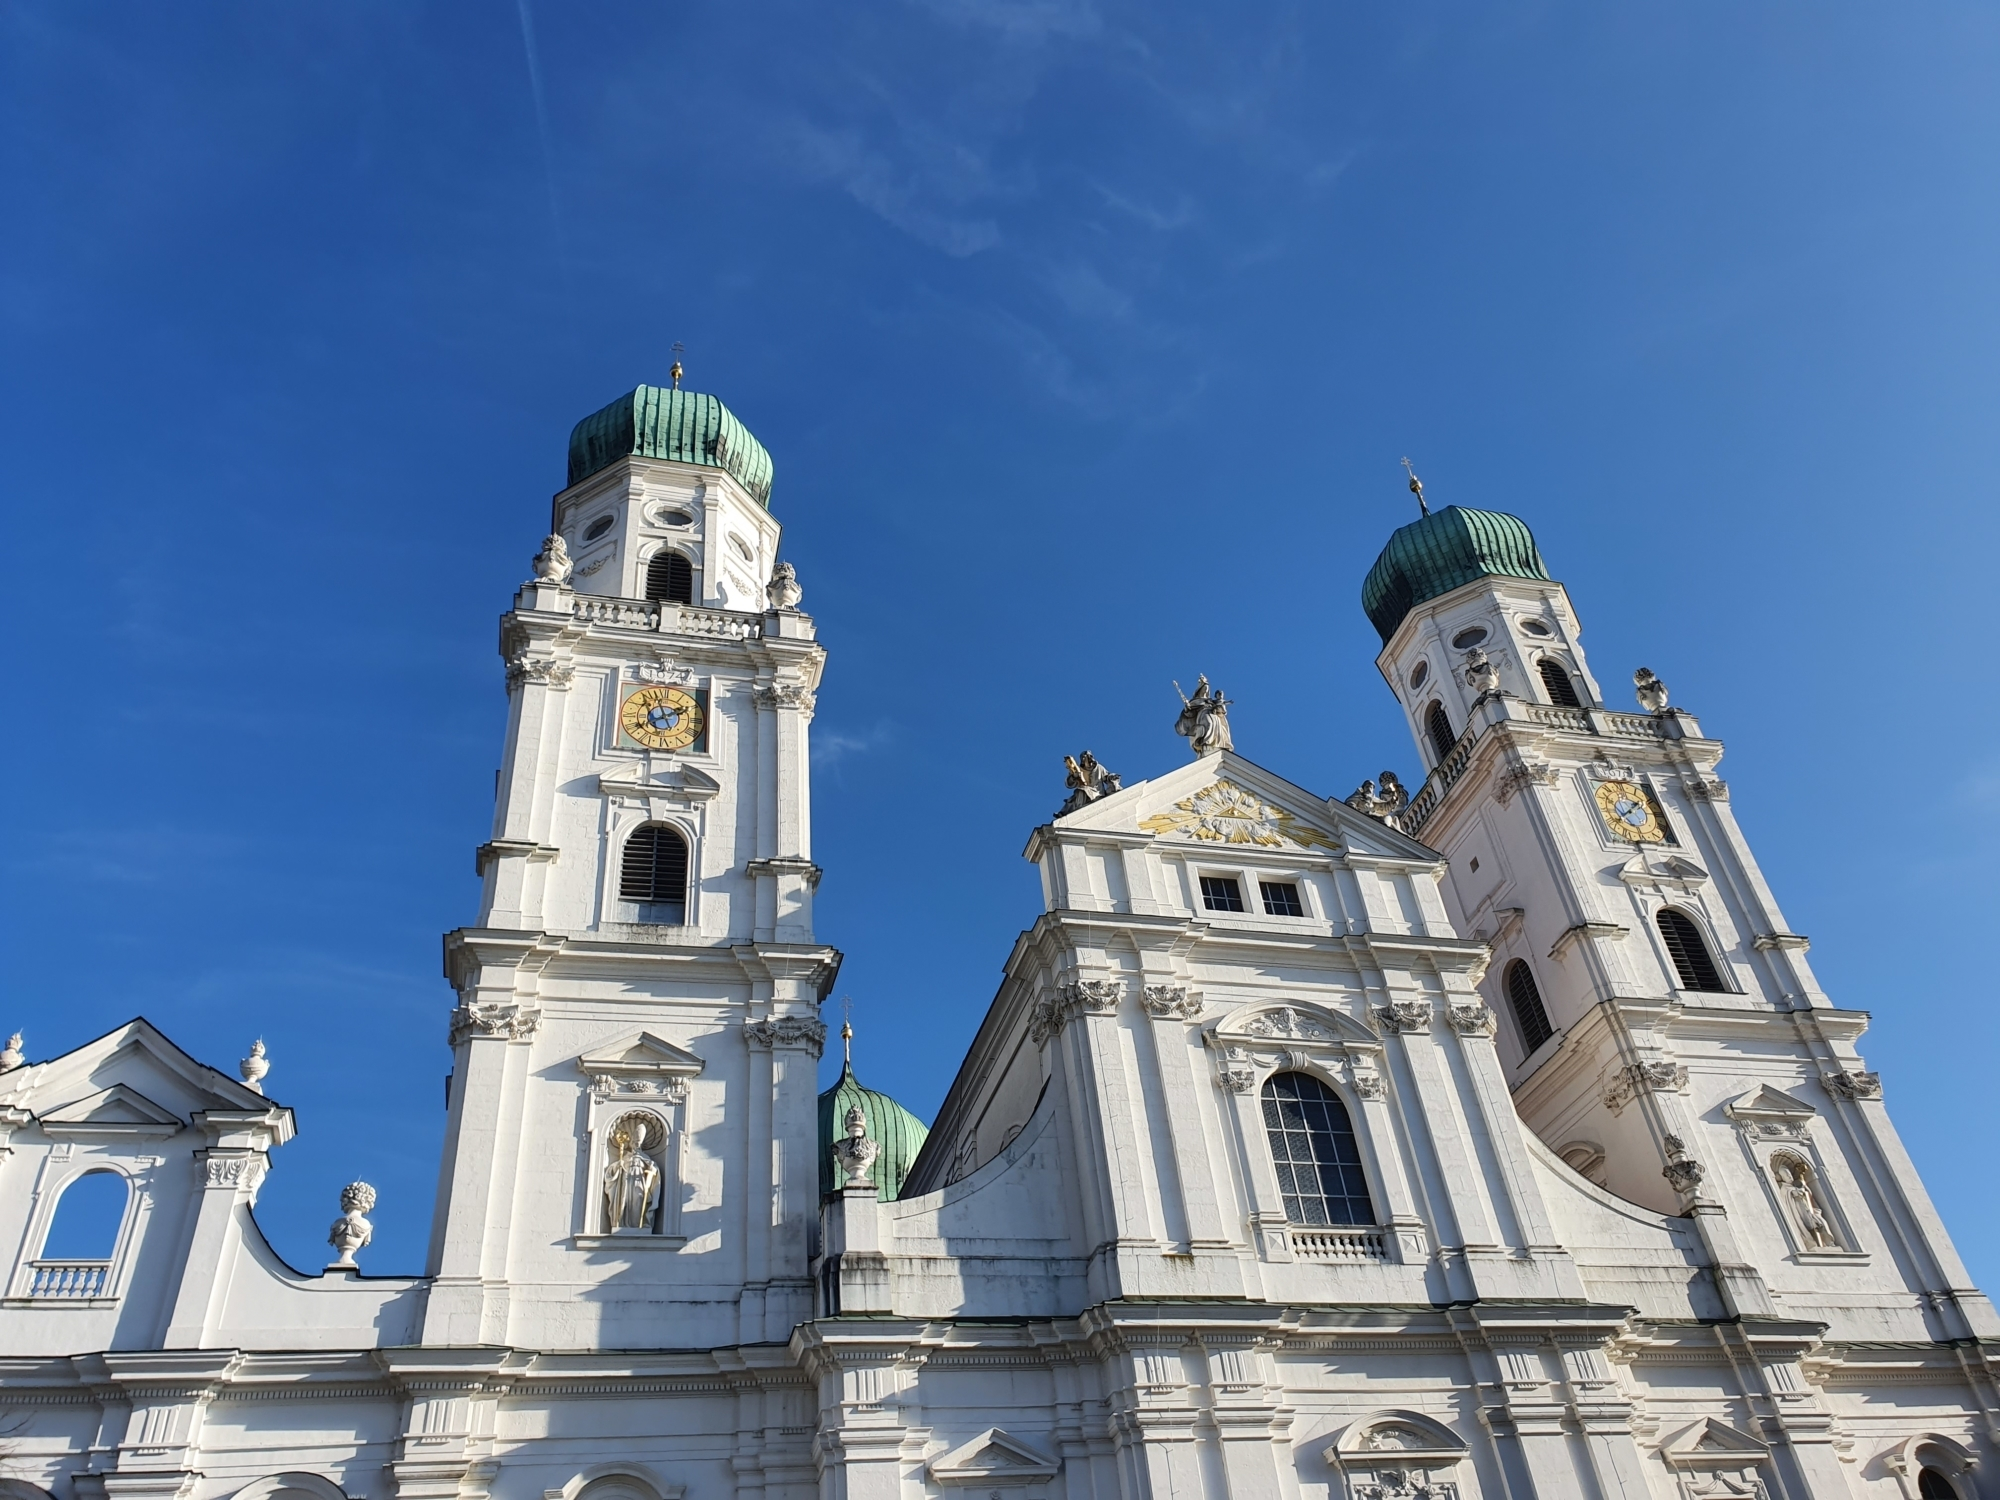 Passauer Stephansdom